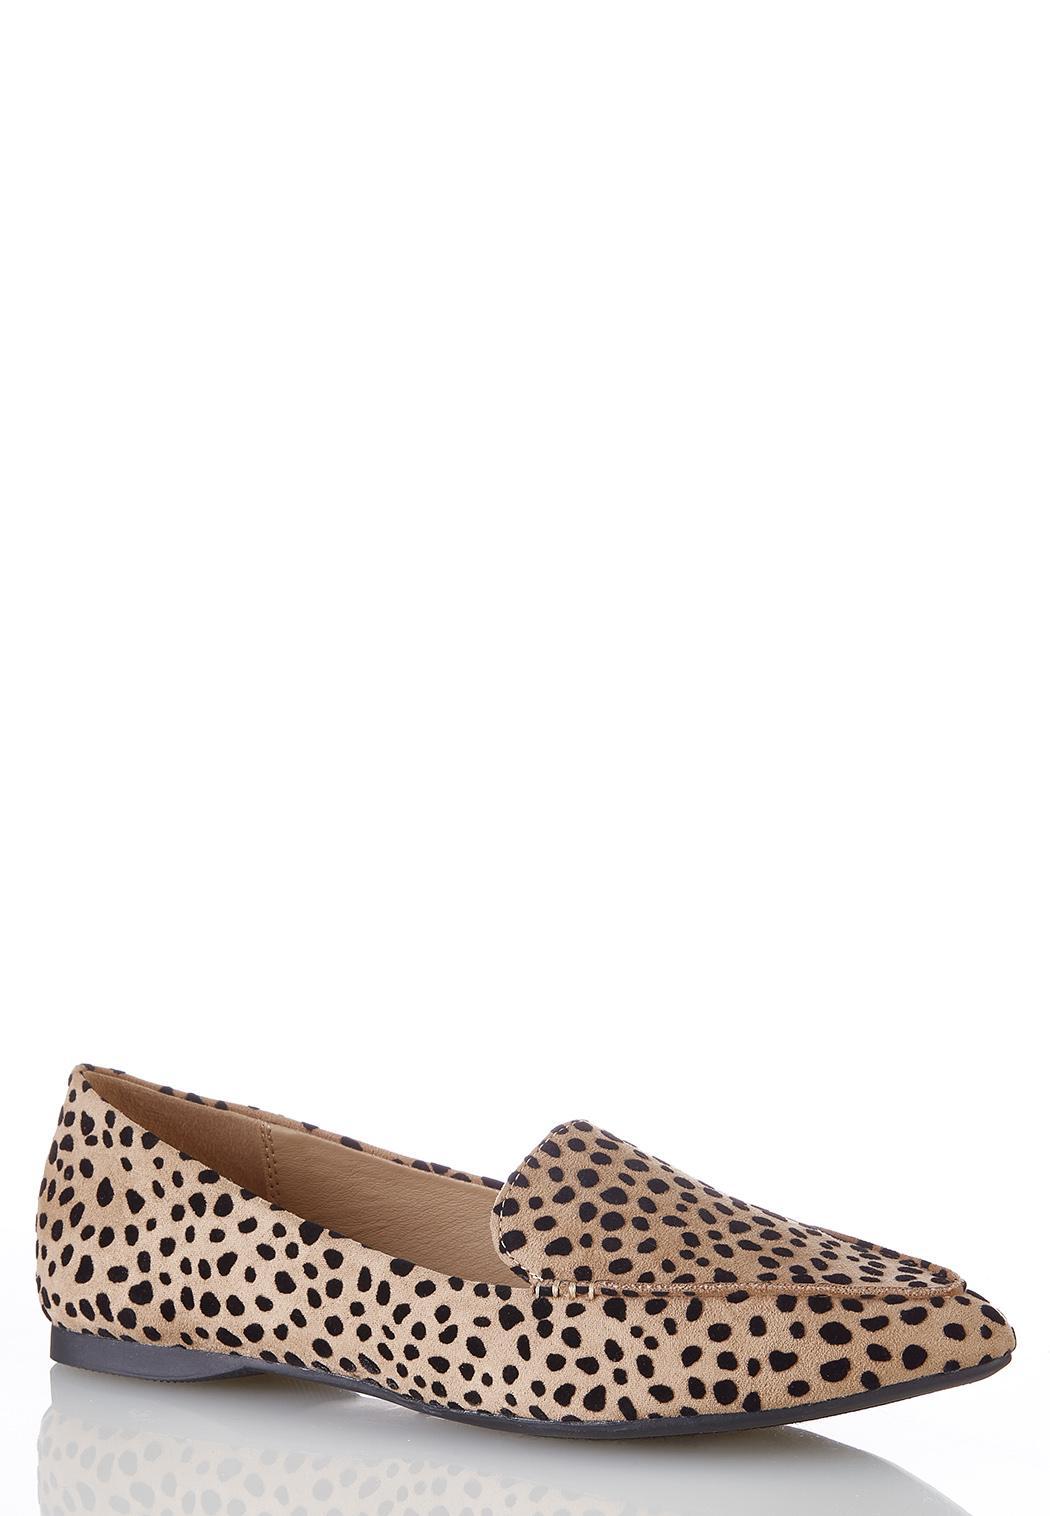 Wide Width Cheetah Pointy Toe Flats